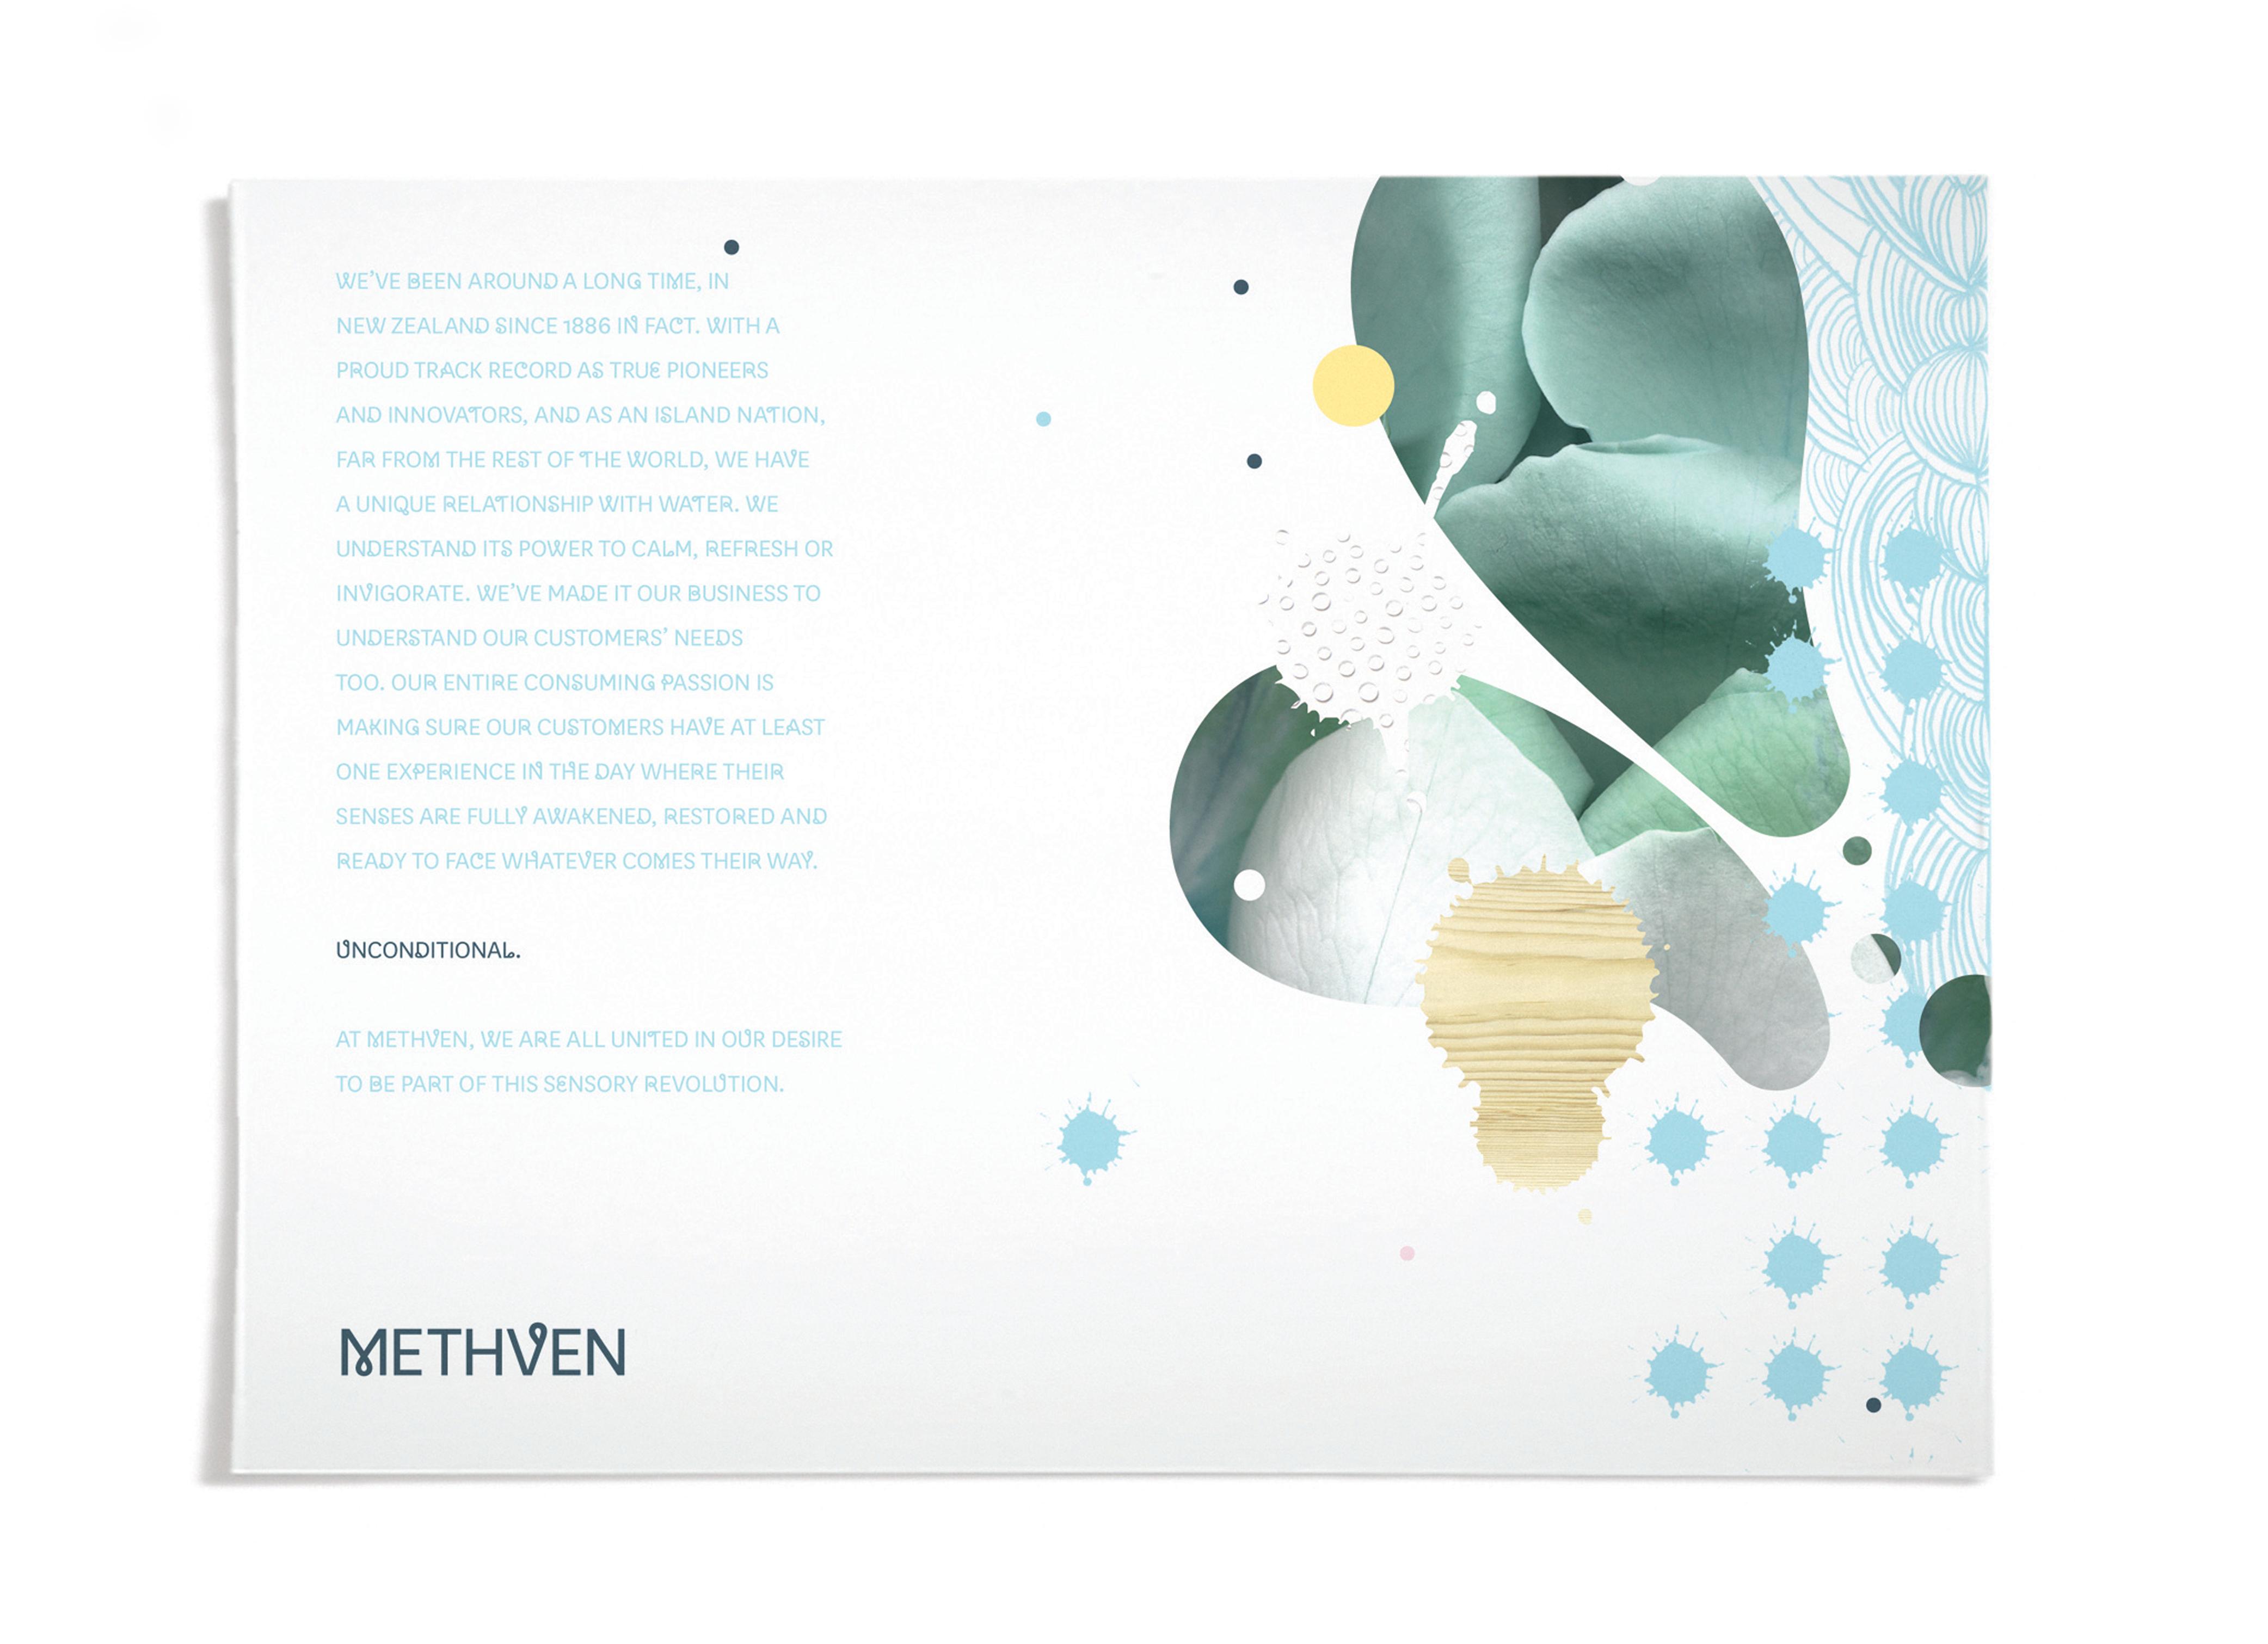 https://tanamitchell.com/wp-content/uploads/2018/10/Methven-2000x1450px7.jpg